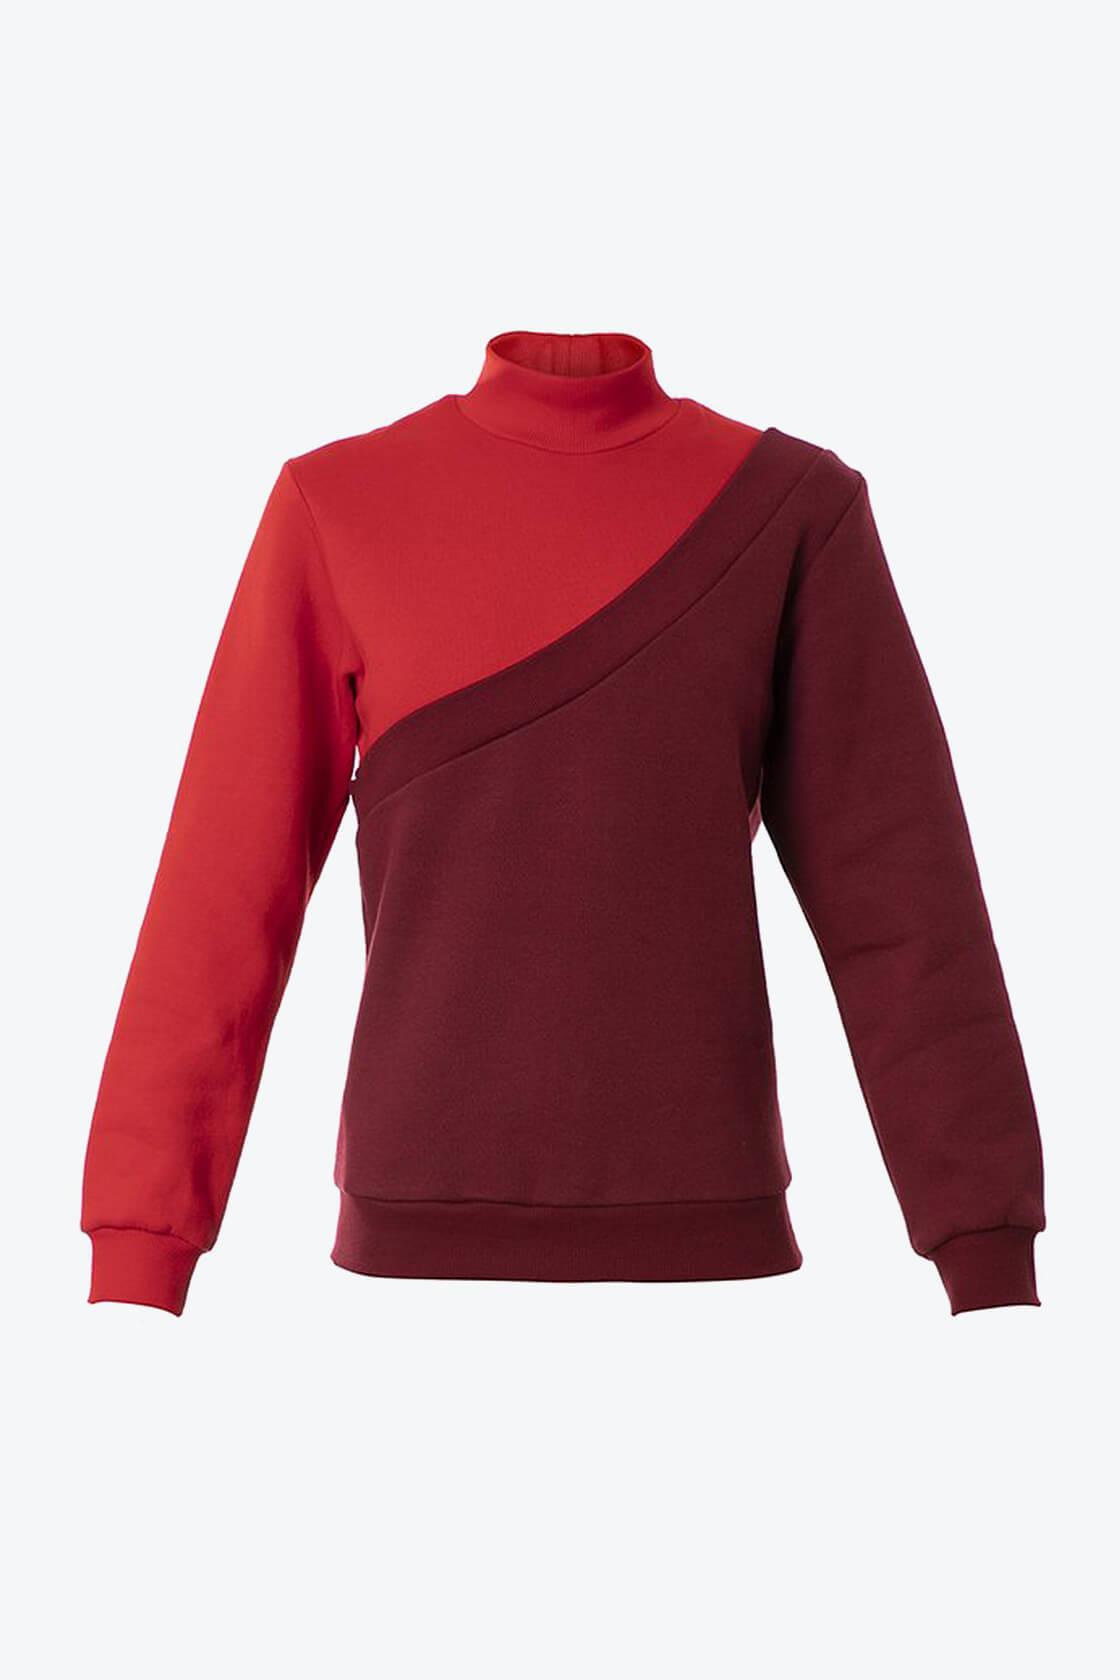 OL10000182 Diagonal sweatshirt red1